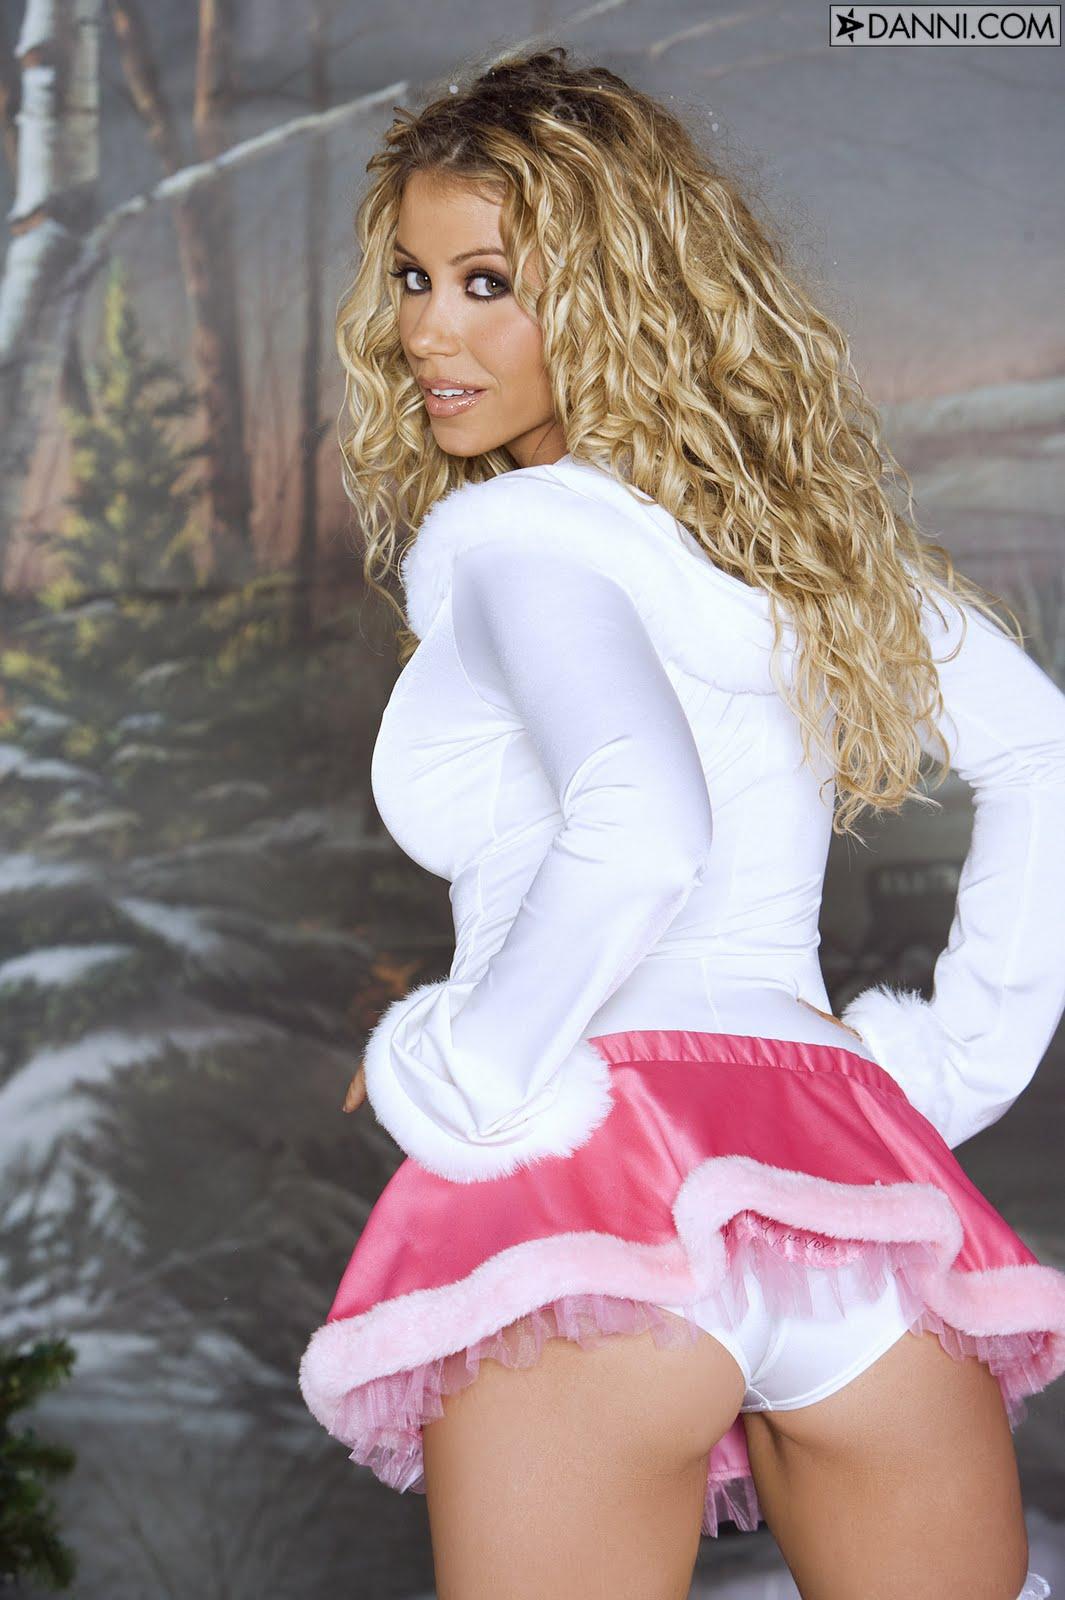 Trixie Tang Masterbate King Christmas Aliskin Alisha Pinkjewels ...